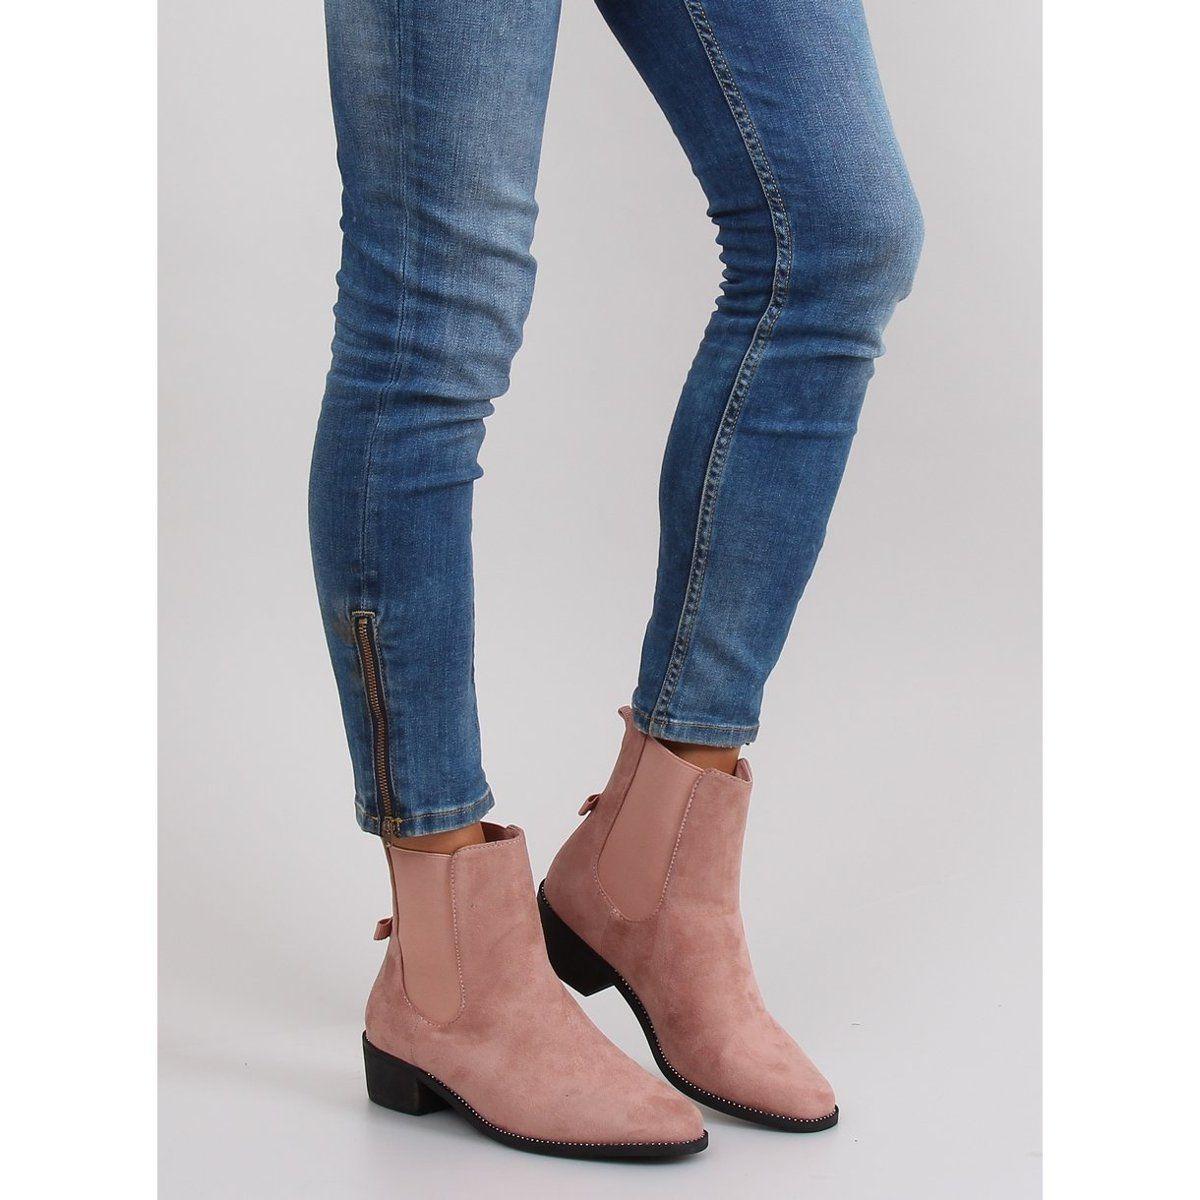 Slender Jodhpur Boots With A Bow M270 Pink Jodhpur Boots Shoes Women Heels Jodhpur